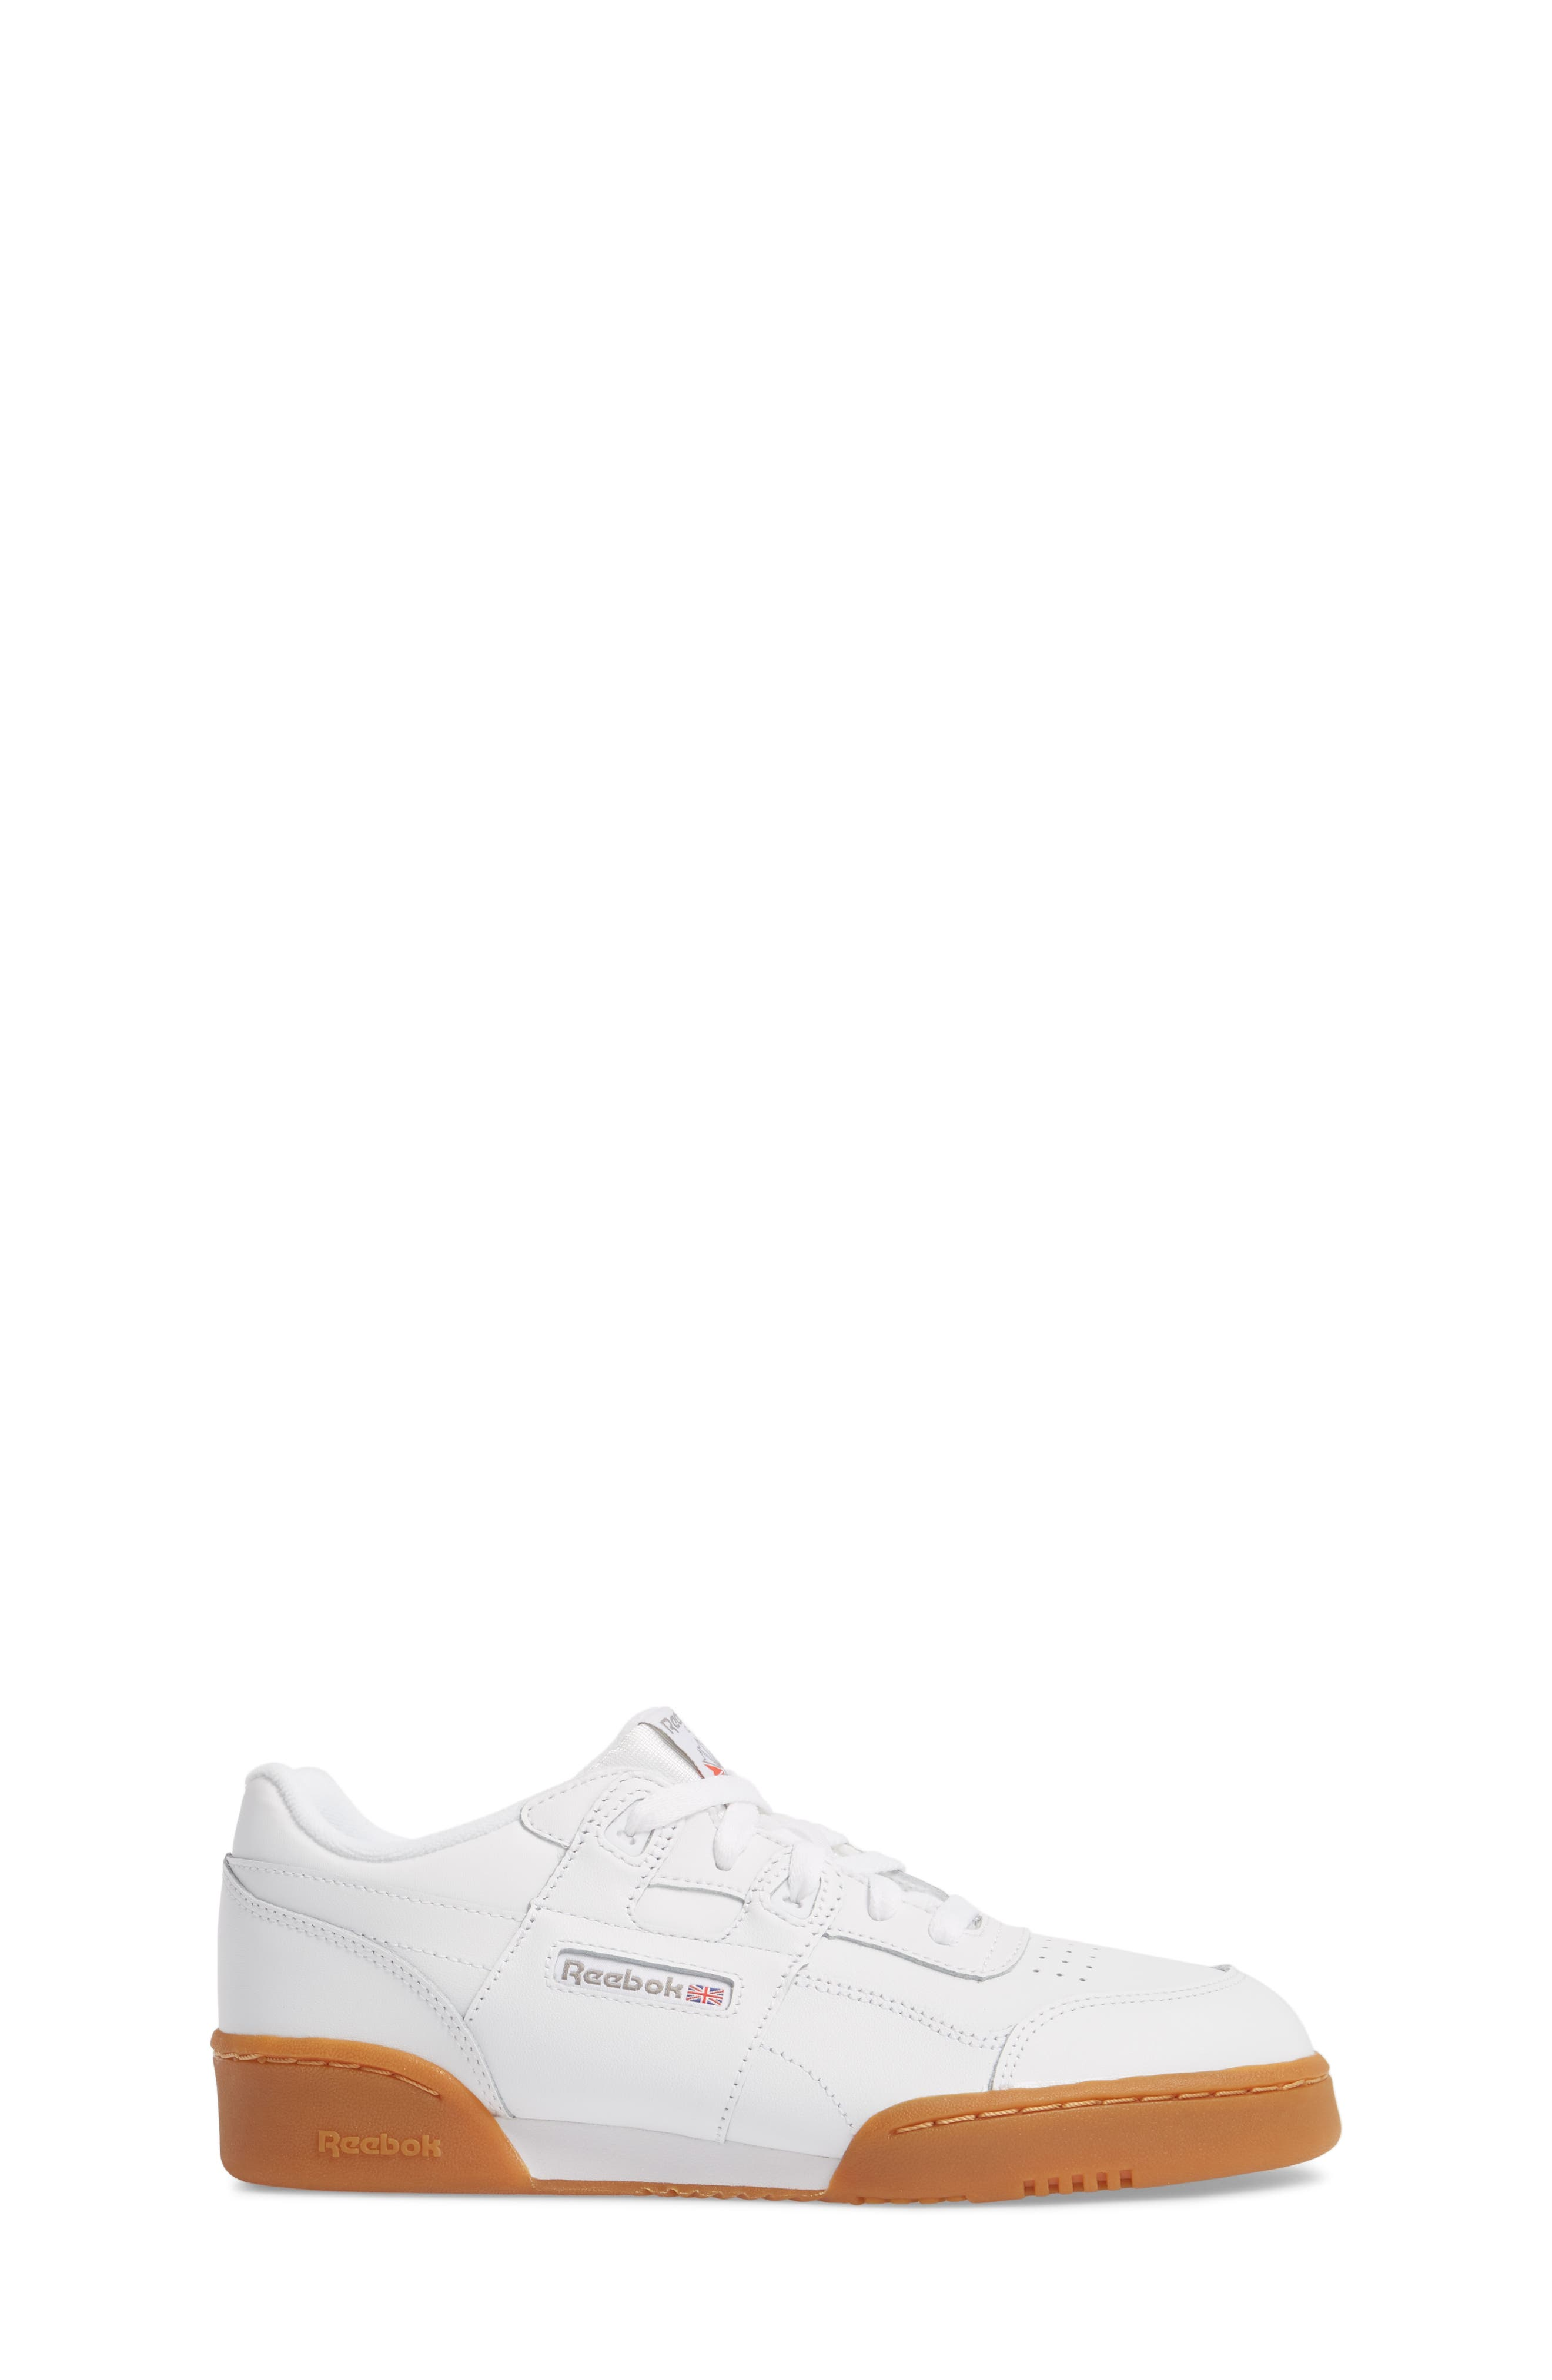 Workout Plus Sneaker,                             Alternate thumbnail 3, color,                             WHITE